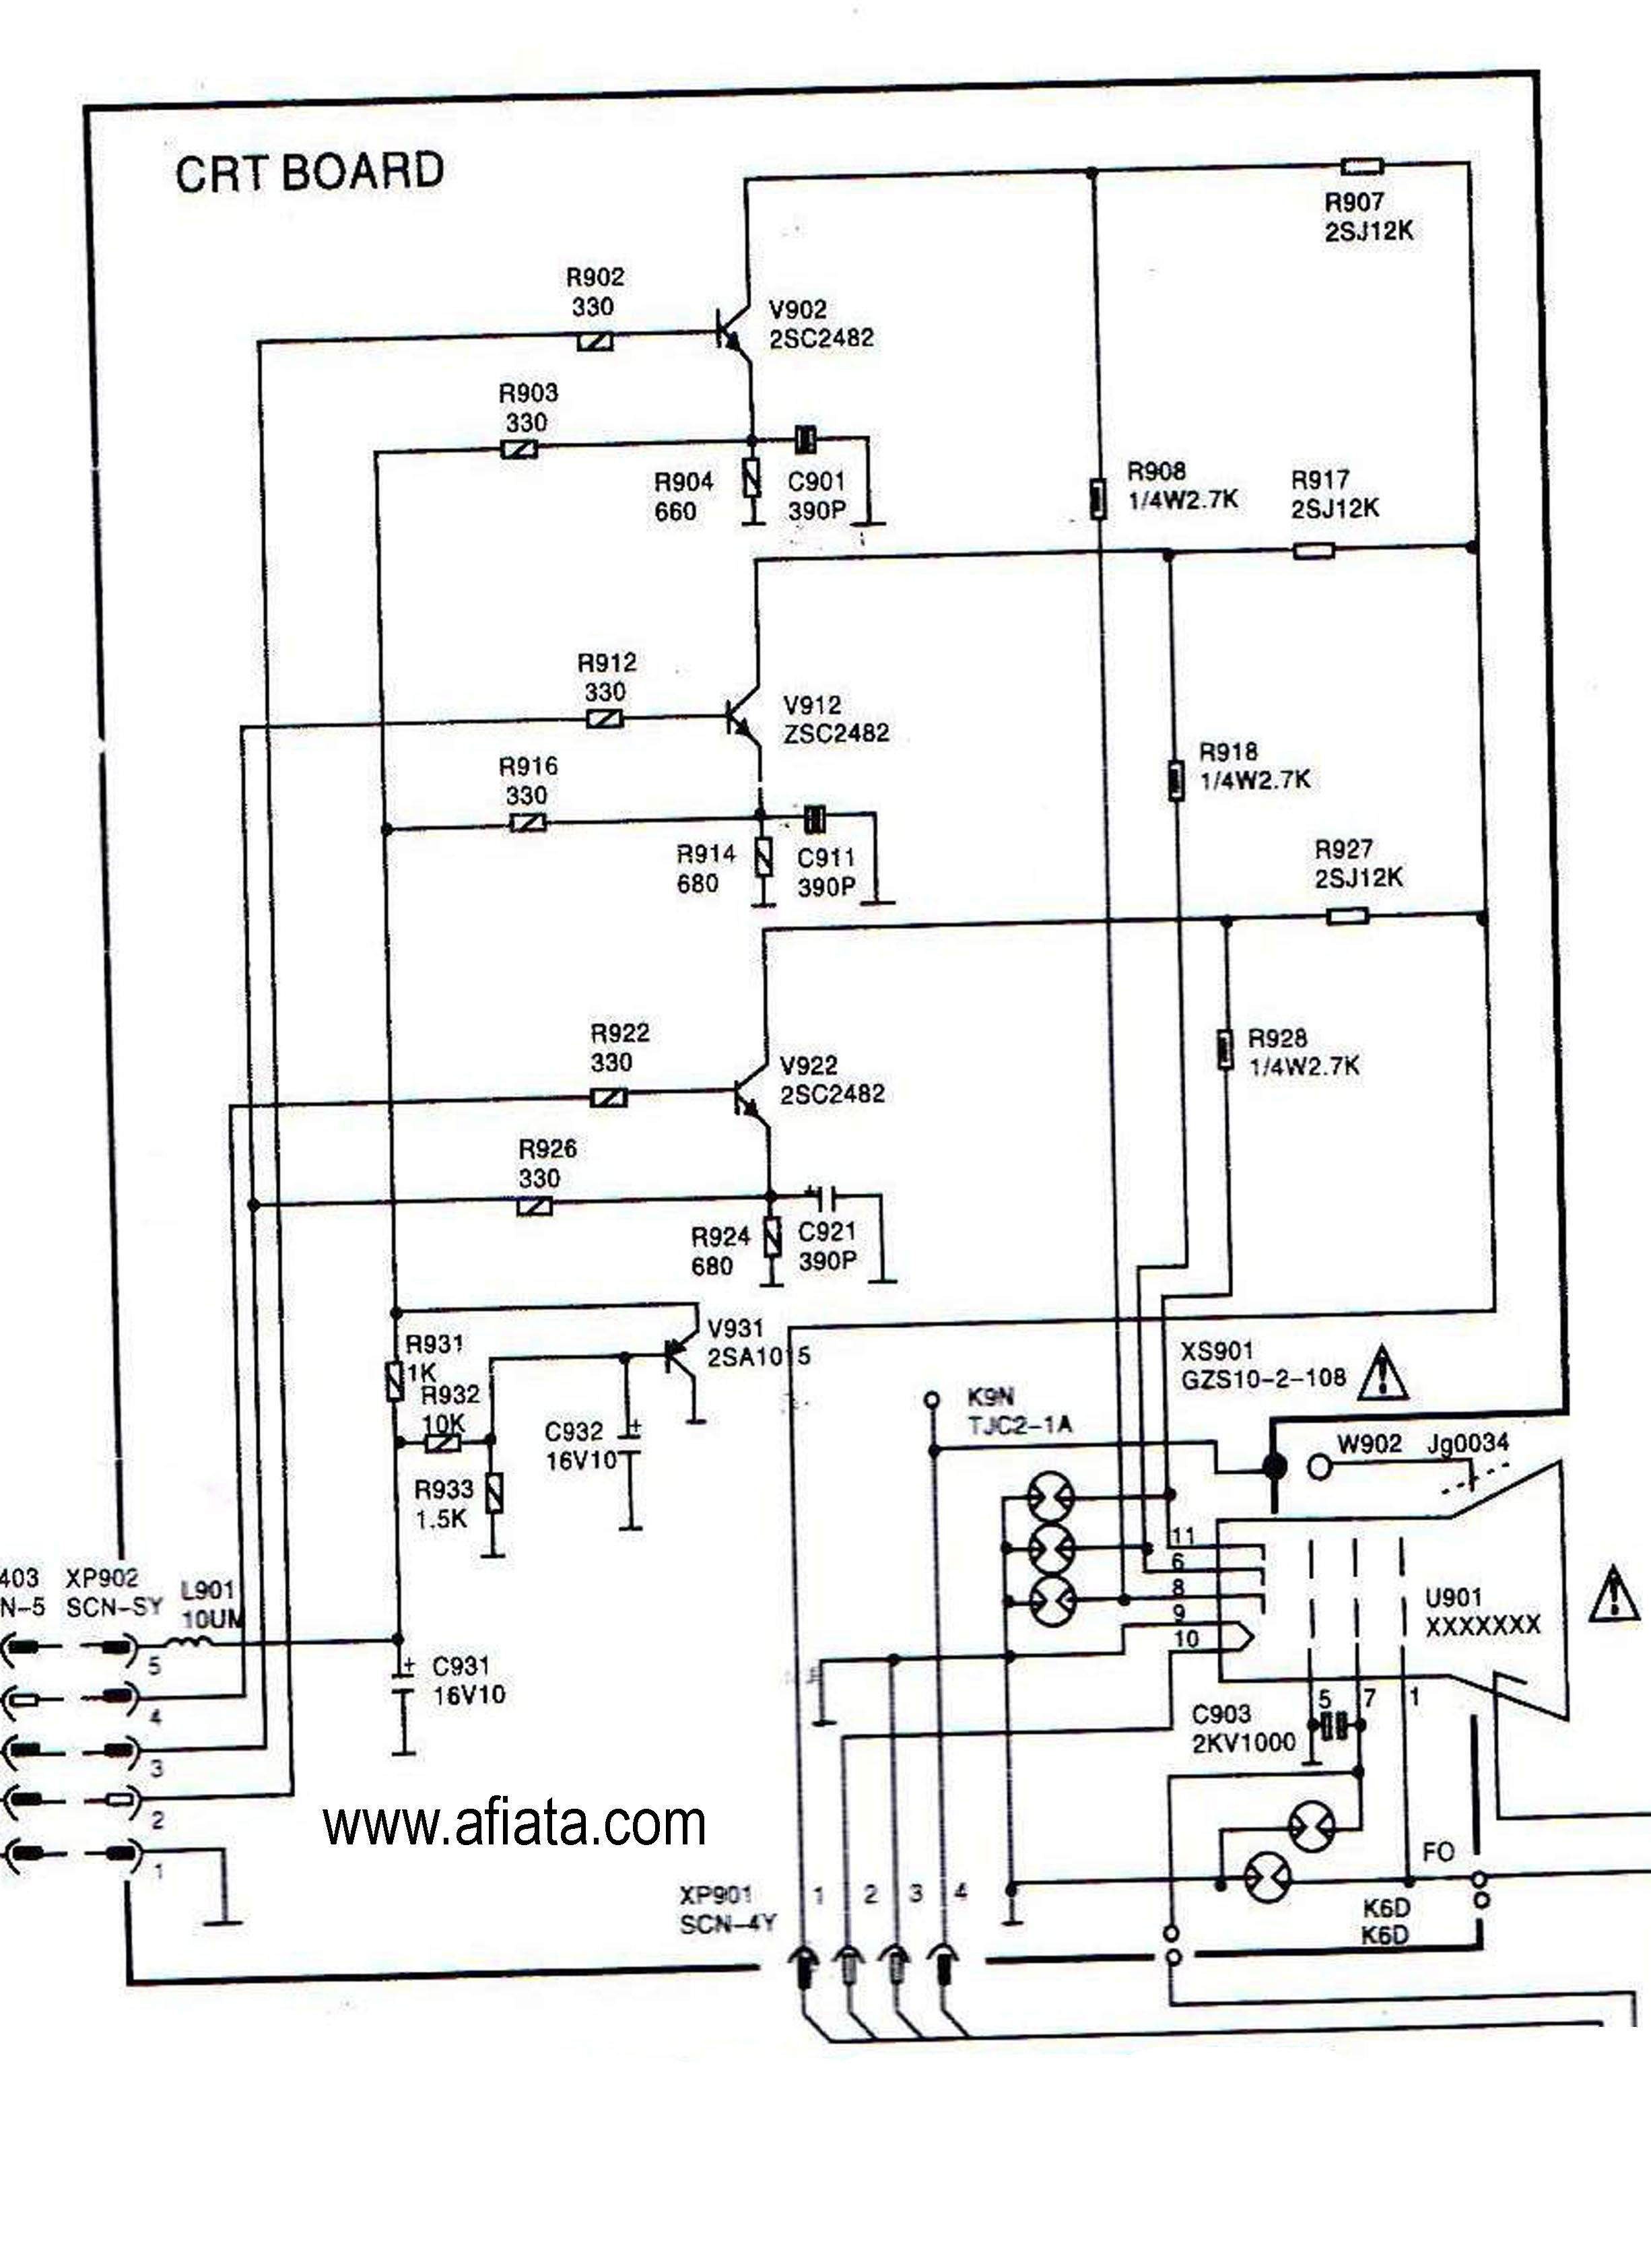 [DIAGRAM] Sansui Tv Circuit Diagram FULL Version HD